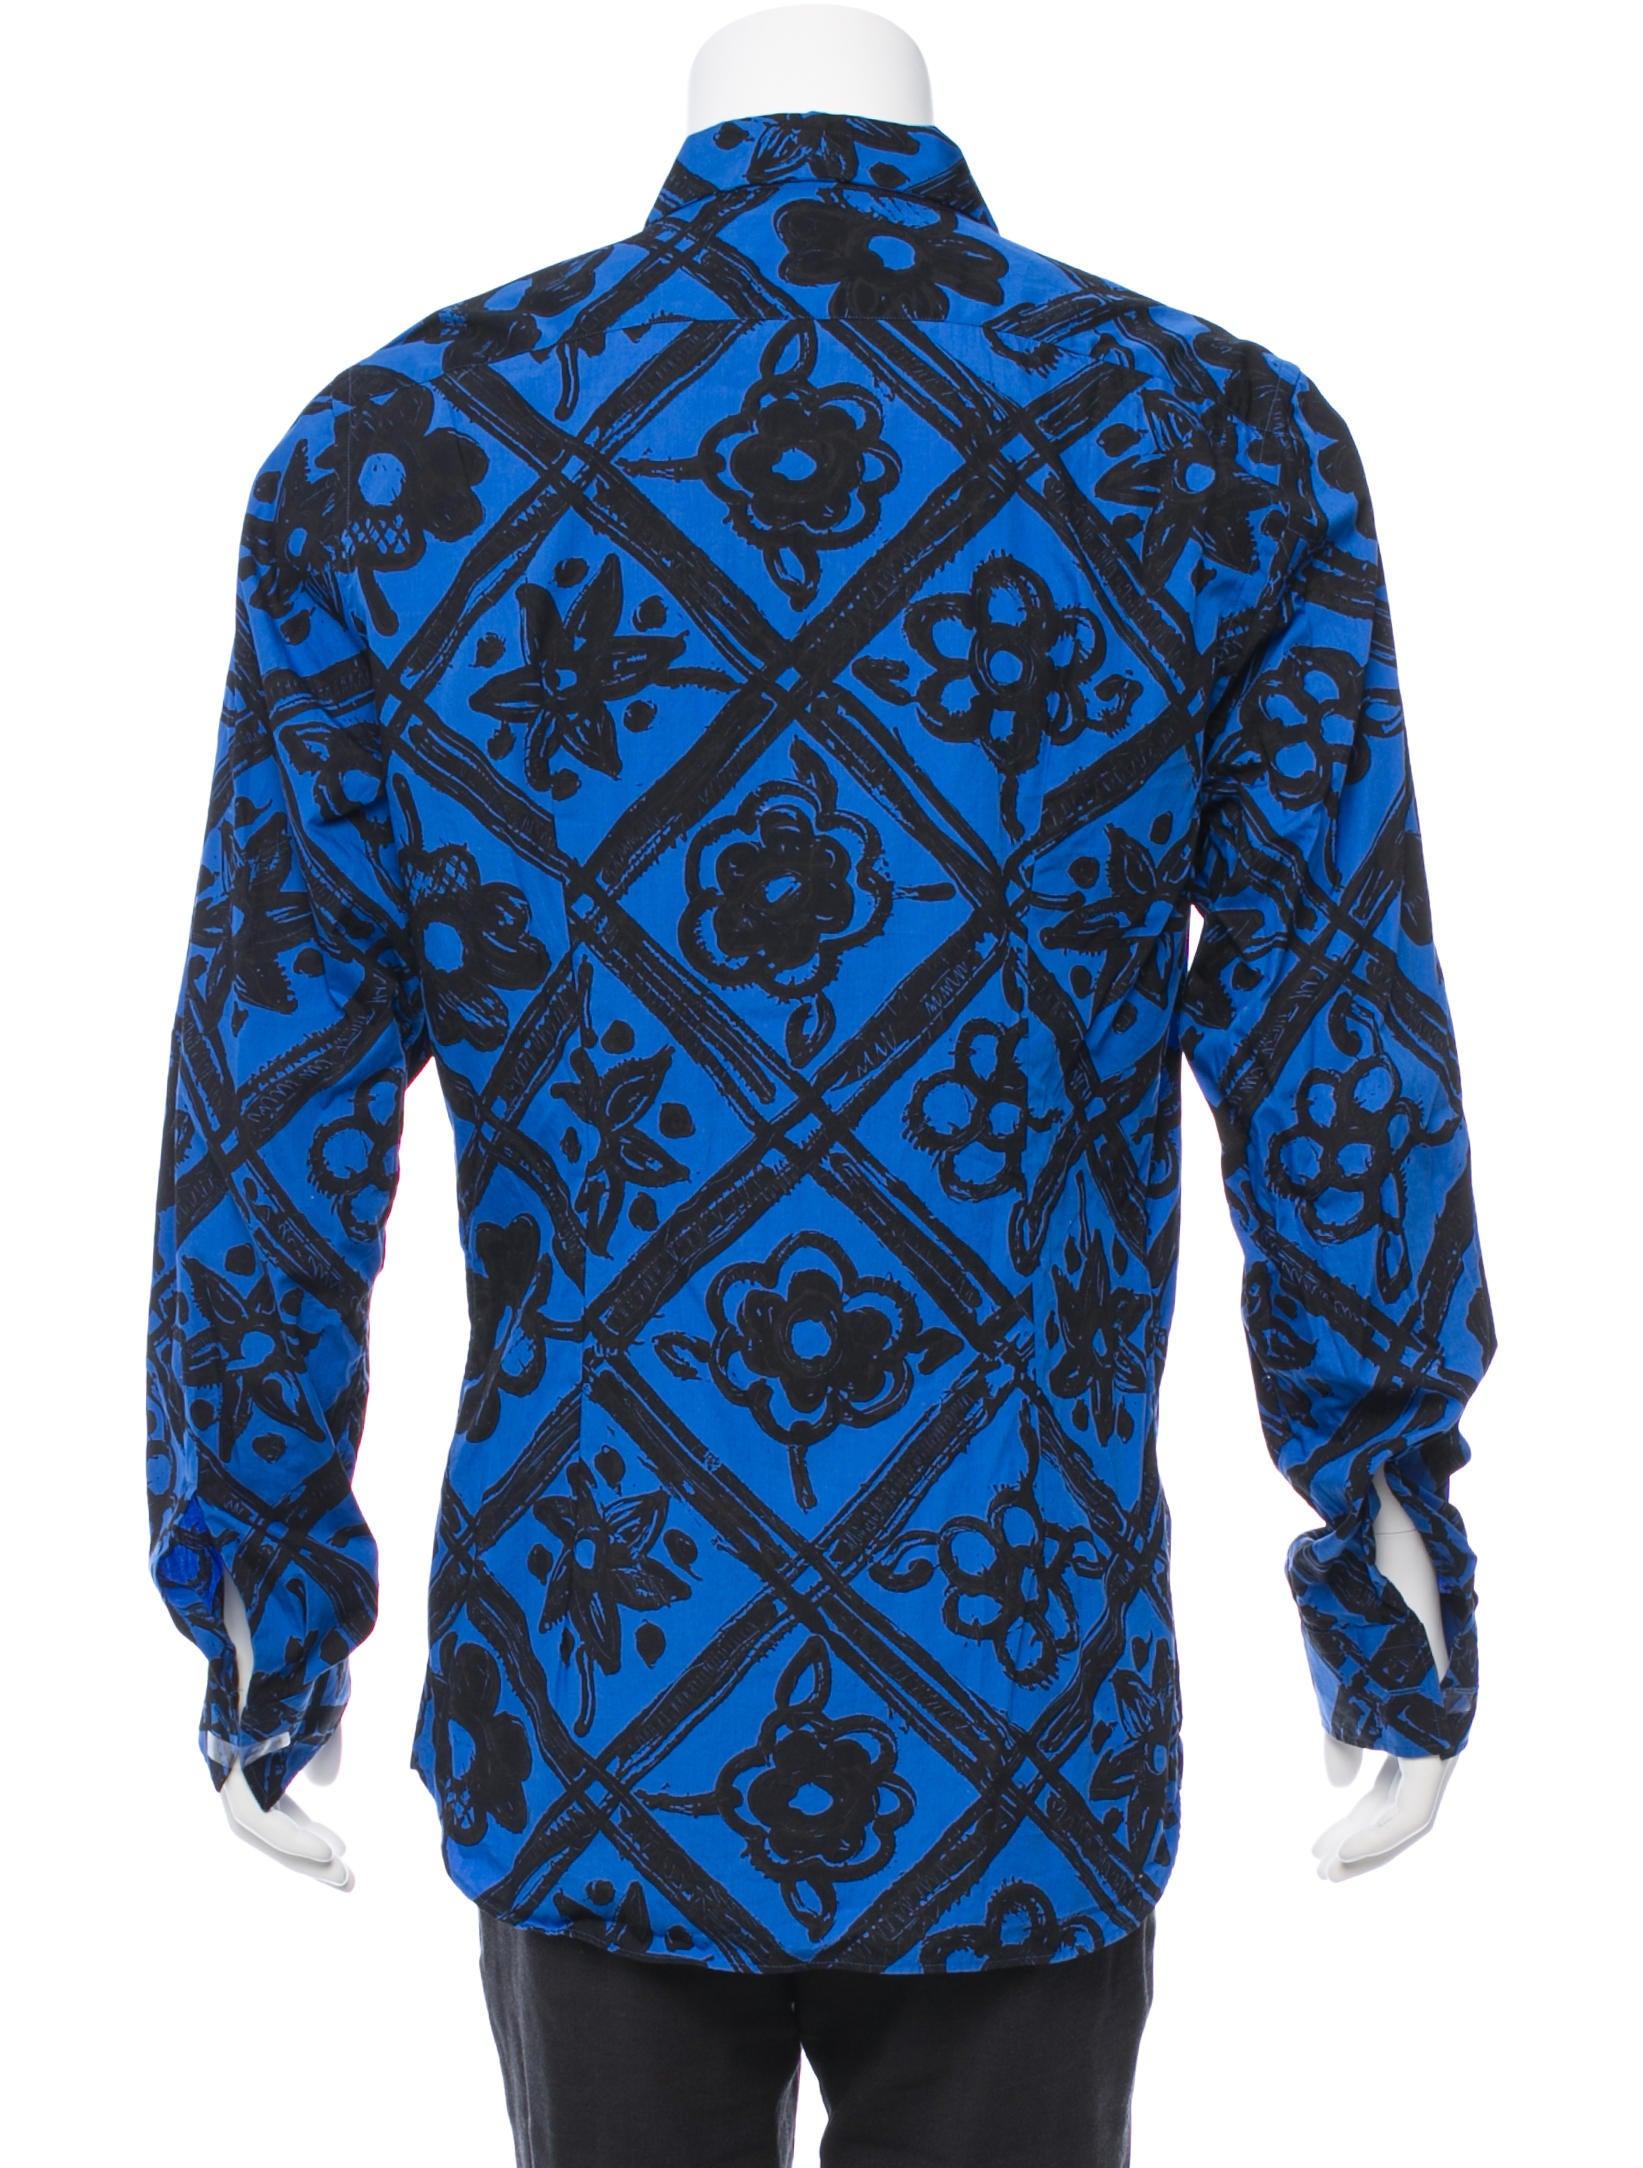 Prada floral print button up shirt clothing pra80928 for Floral print button up shirt